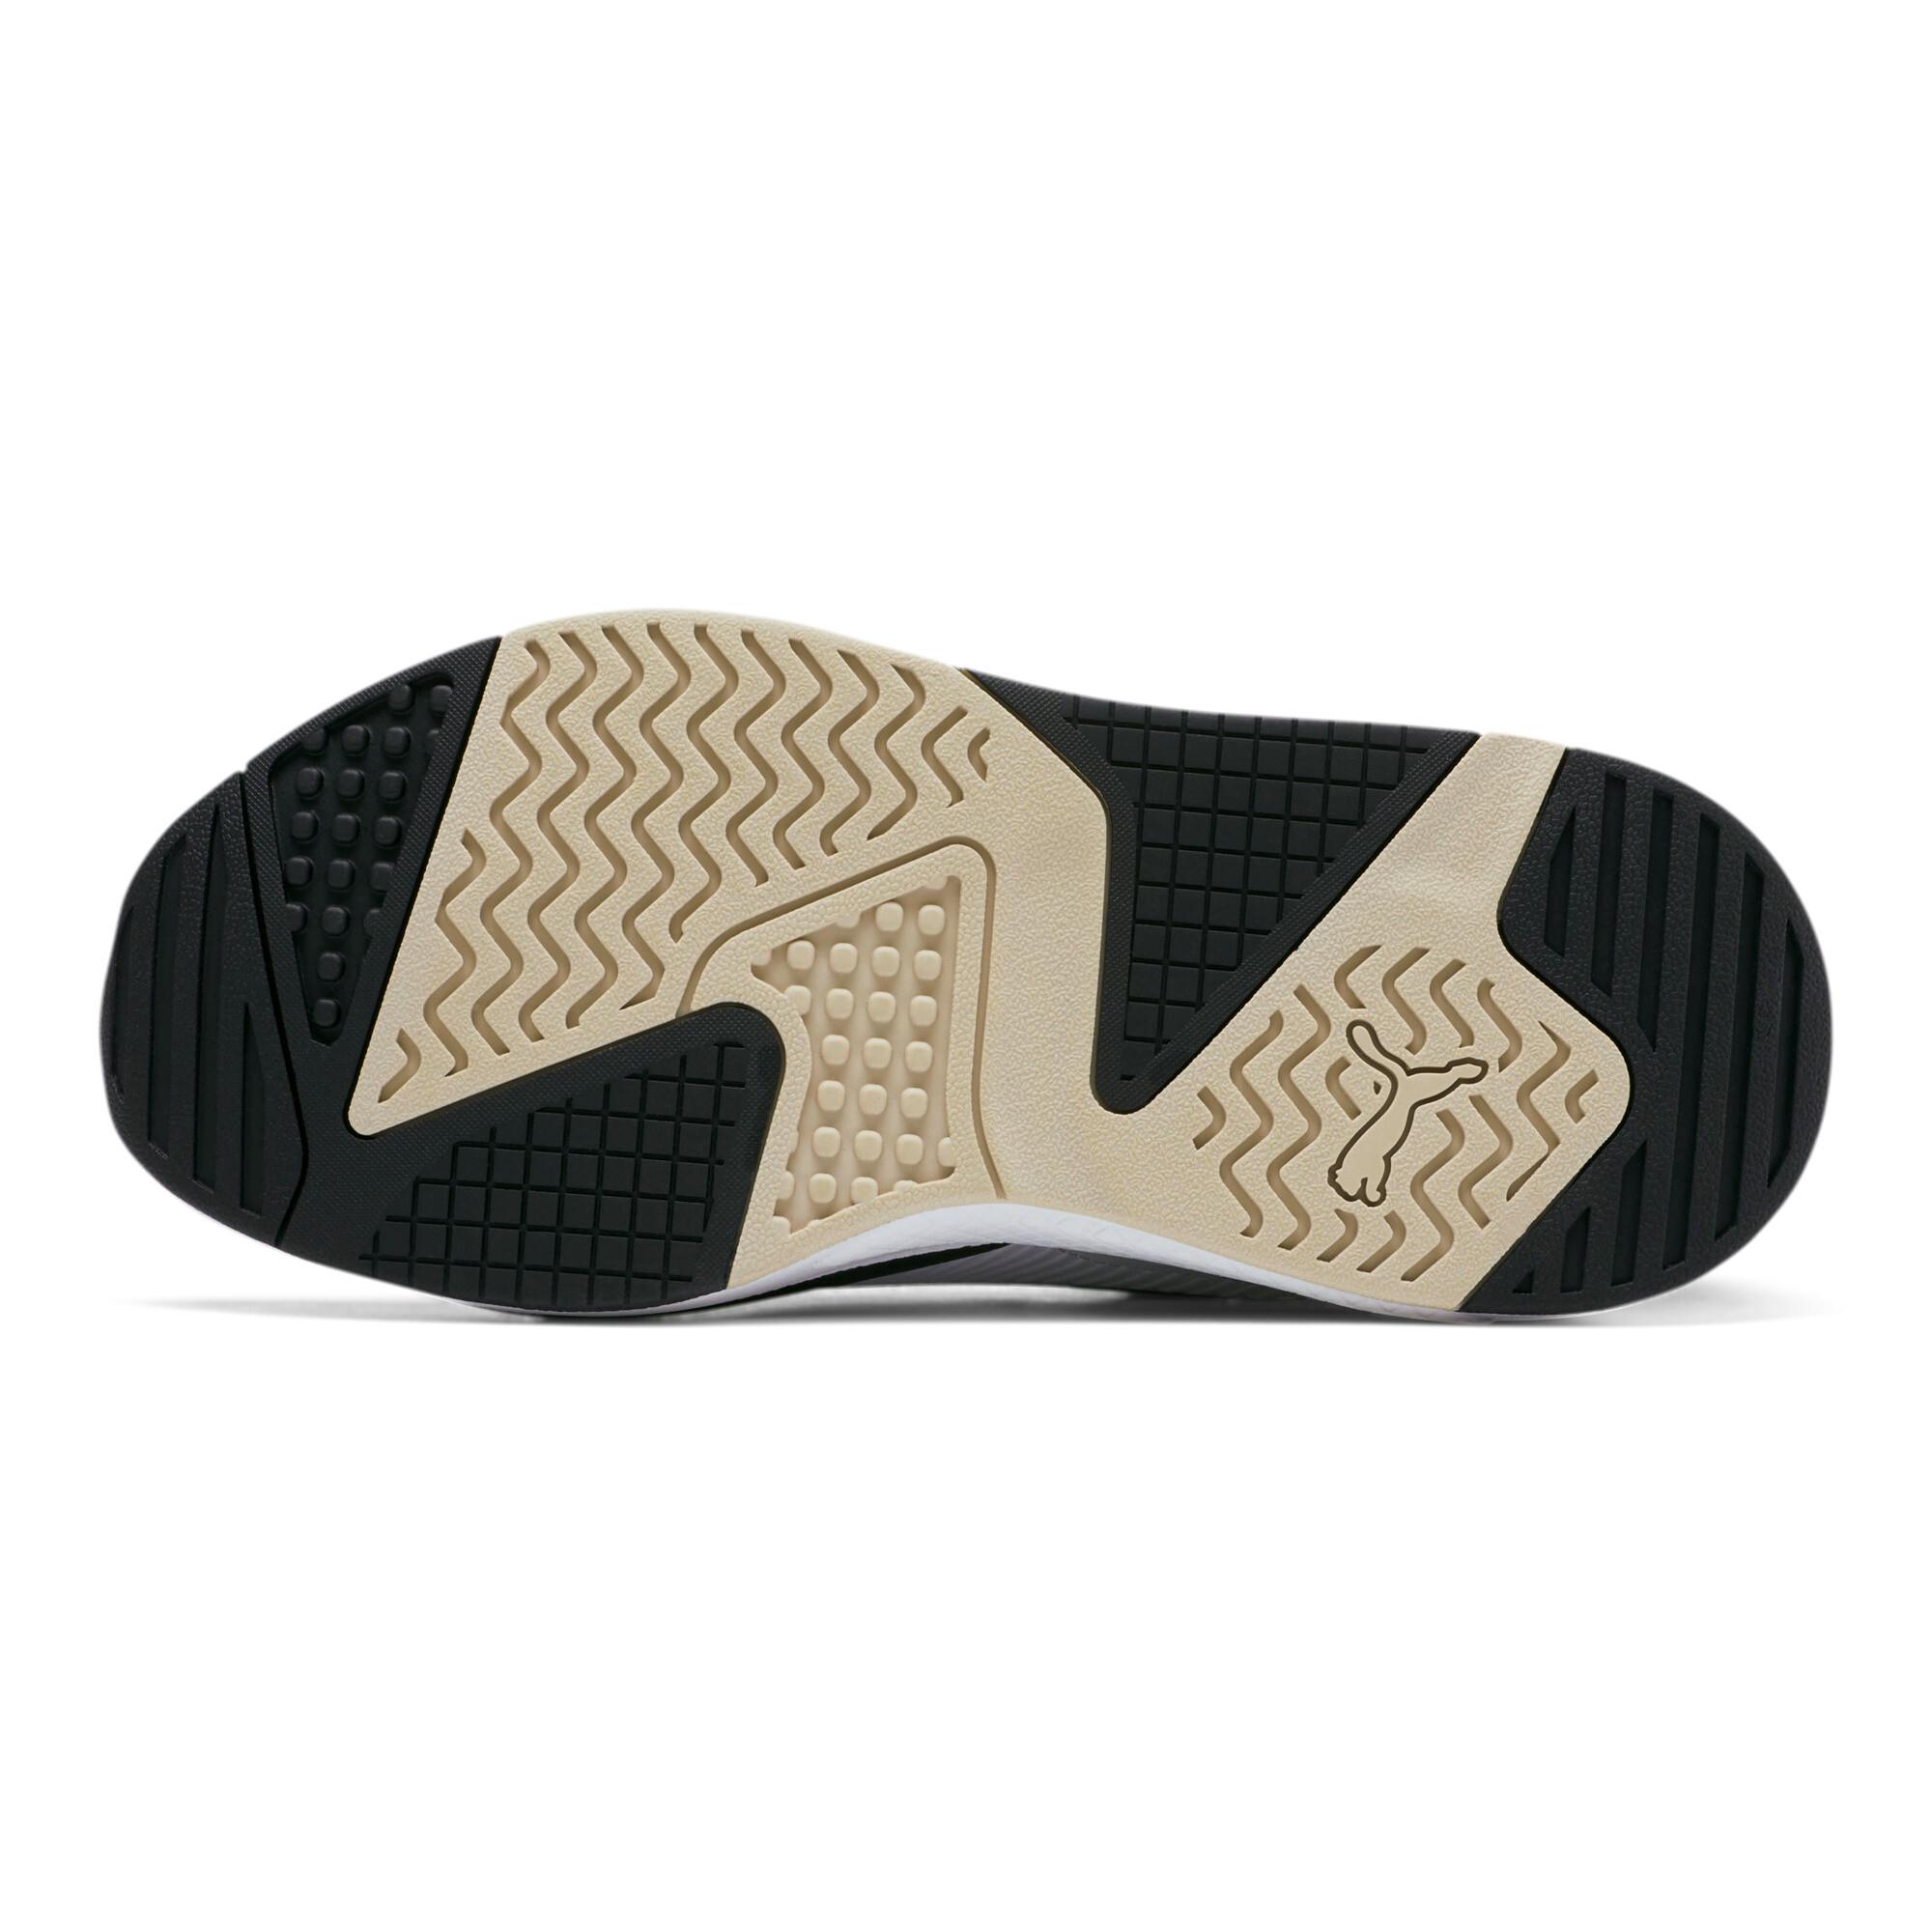 PUMA-Women-039-s-X-RAY-Reptile-Sneakers thumbnail 5